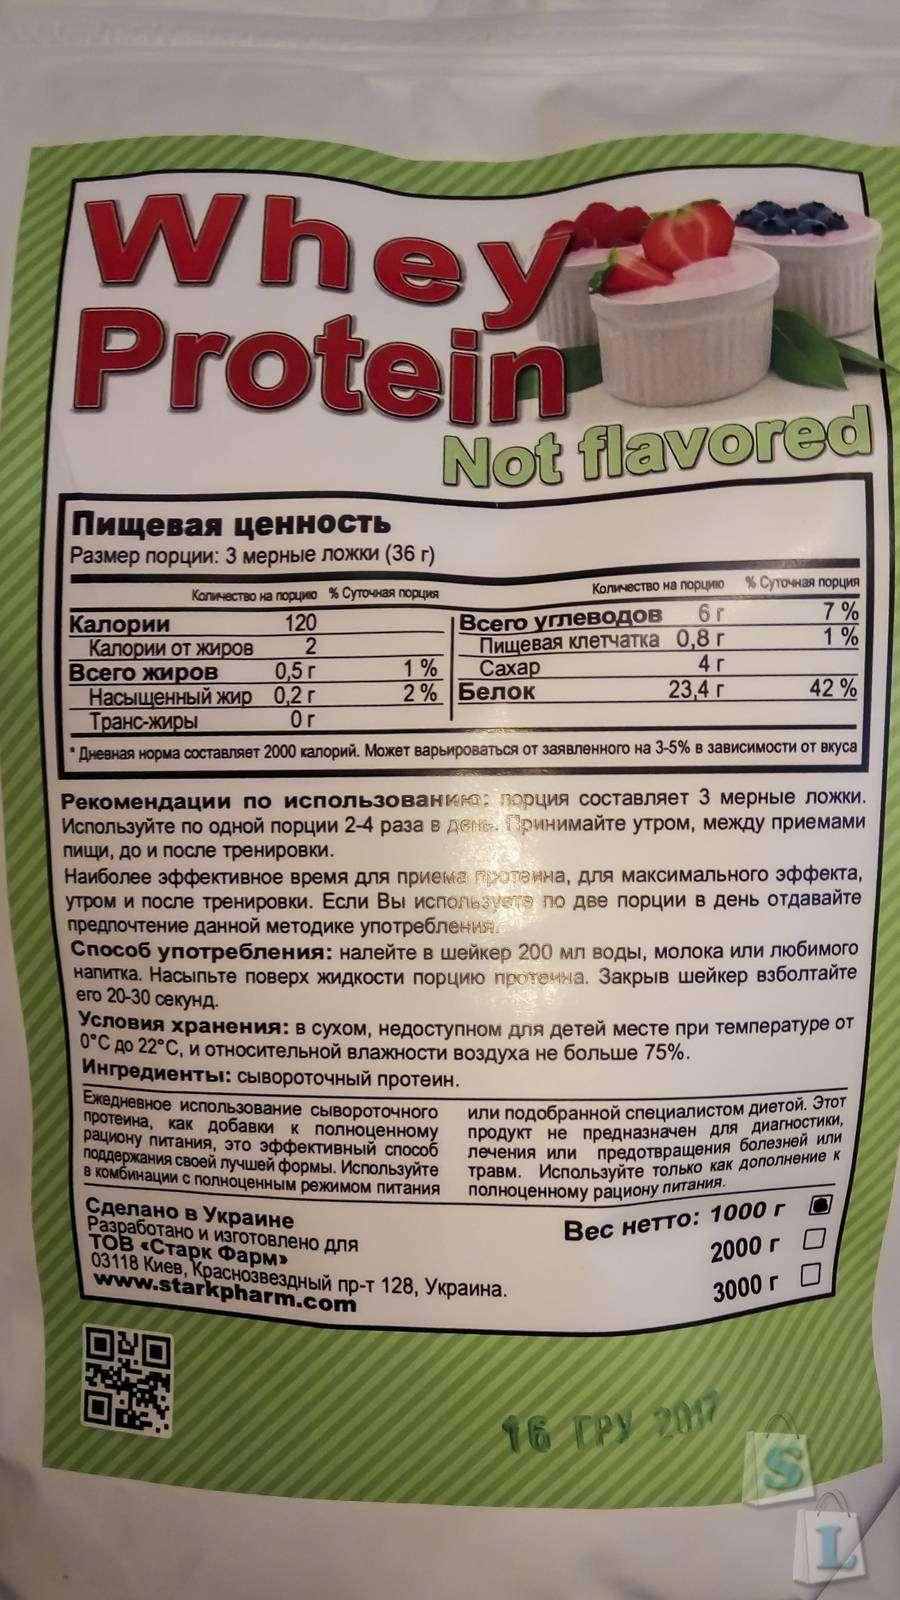 Proteininkiev: Обзор набора спортпита - протеин, креатин по антикризисной цене